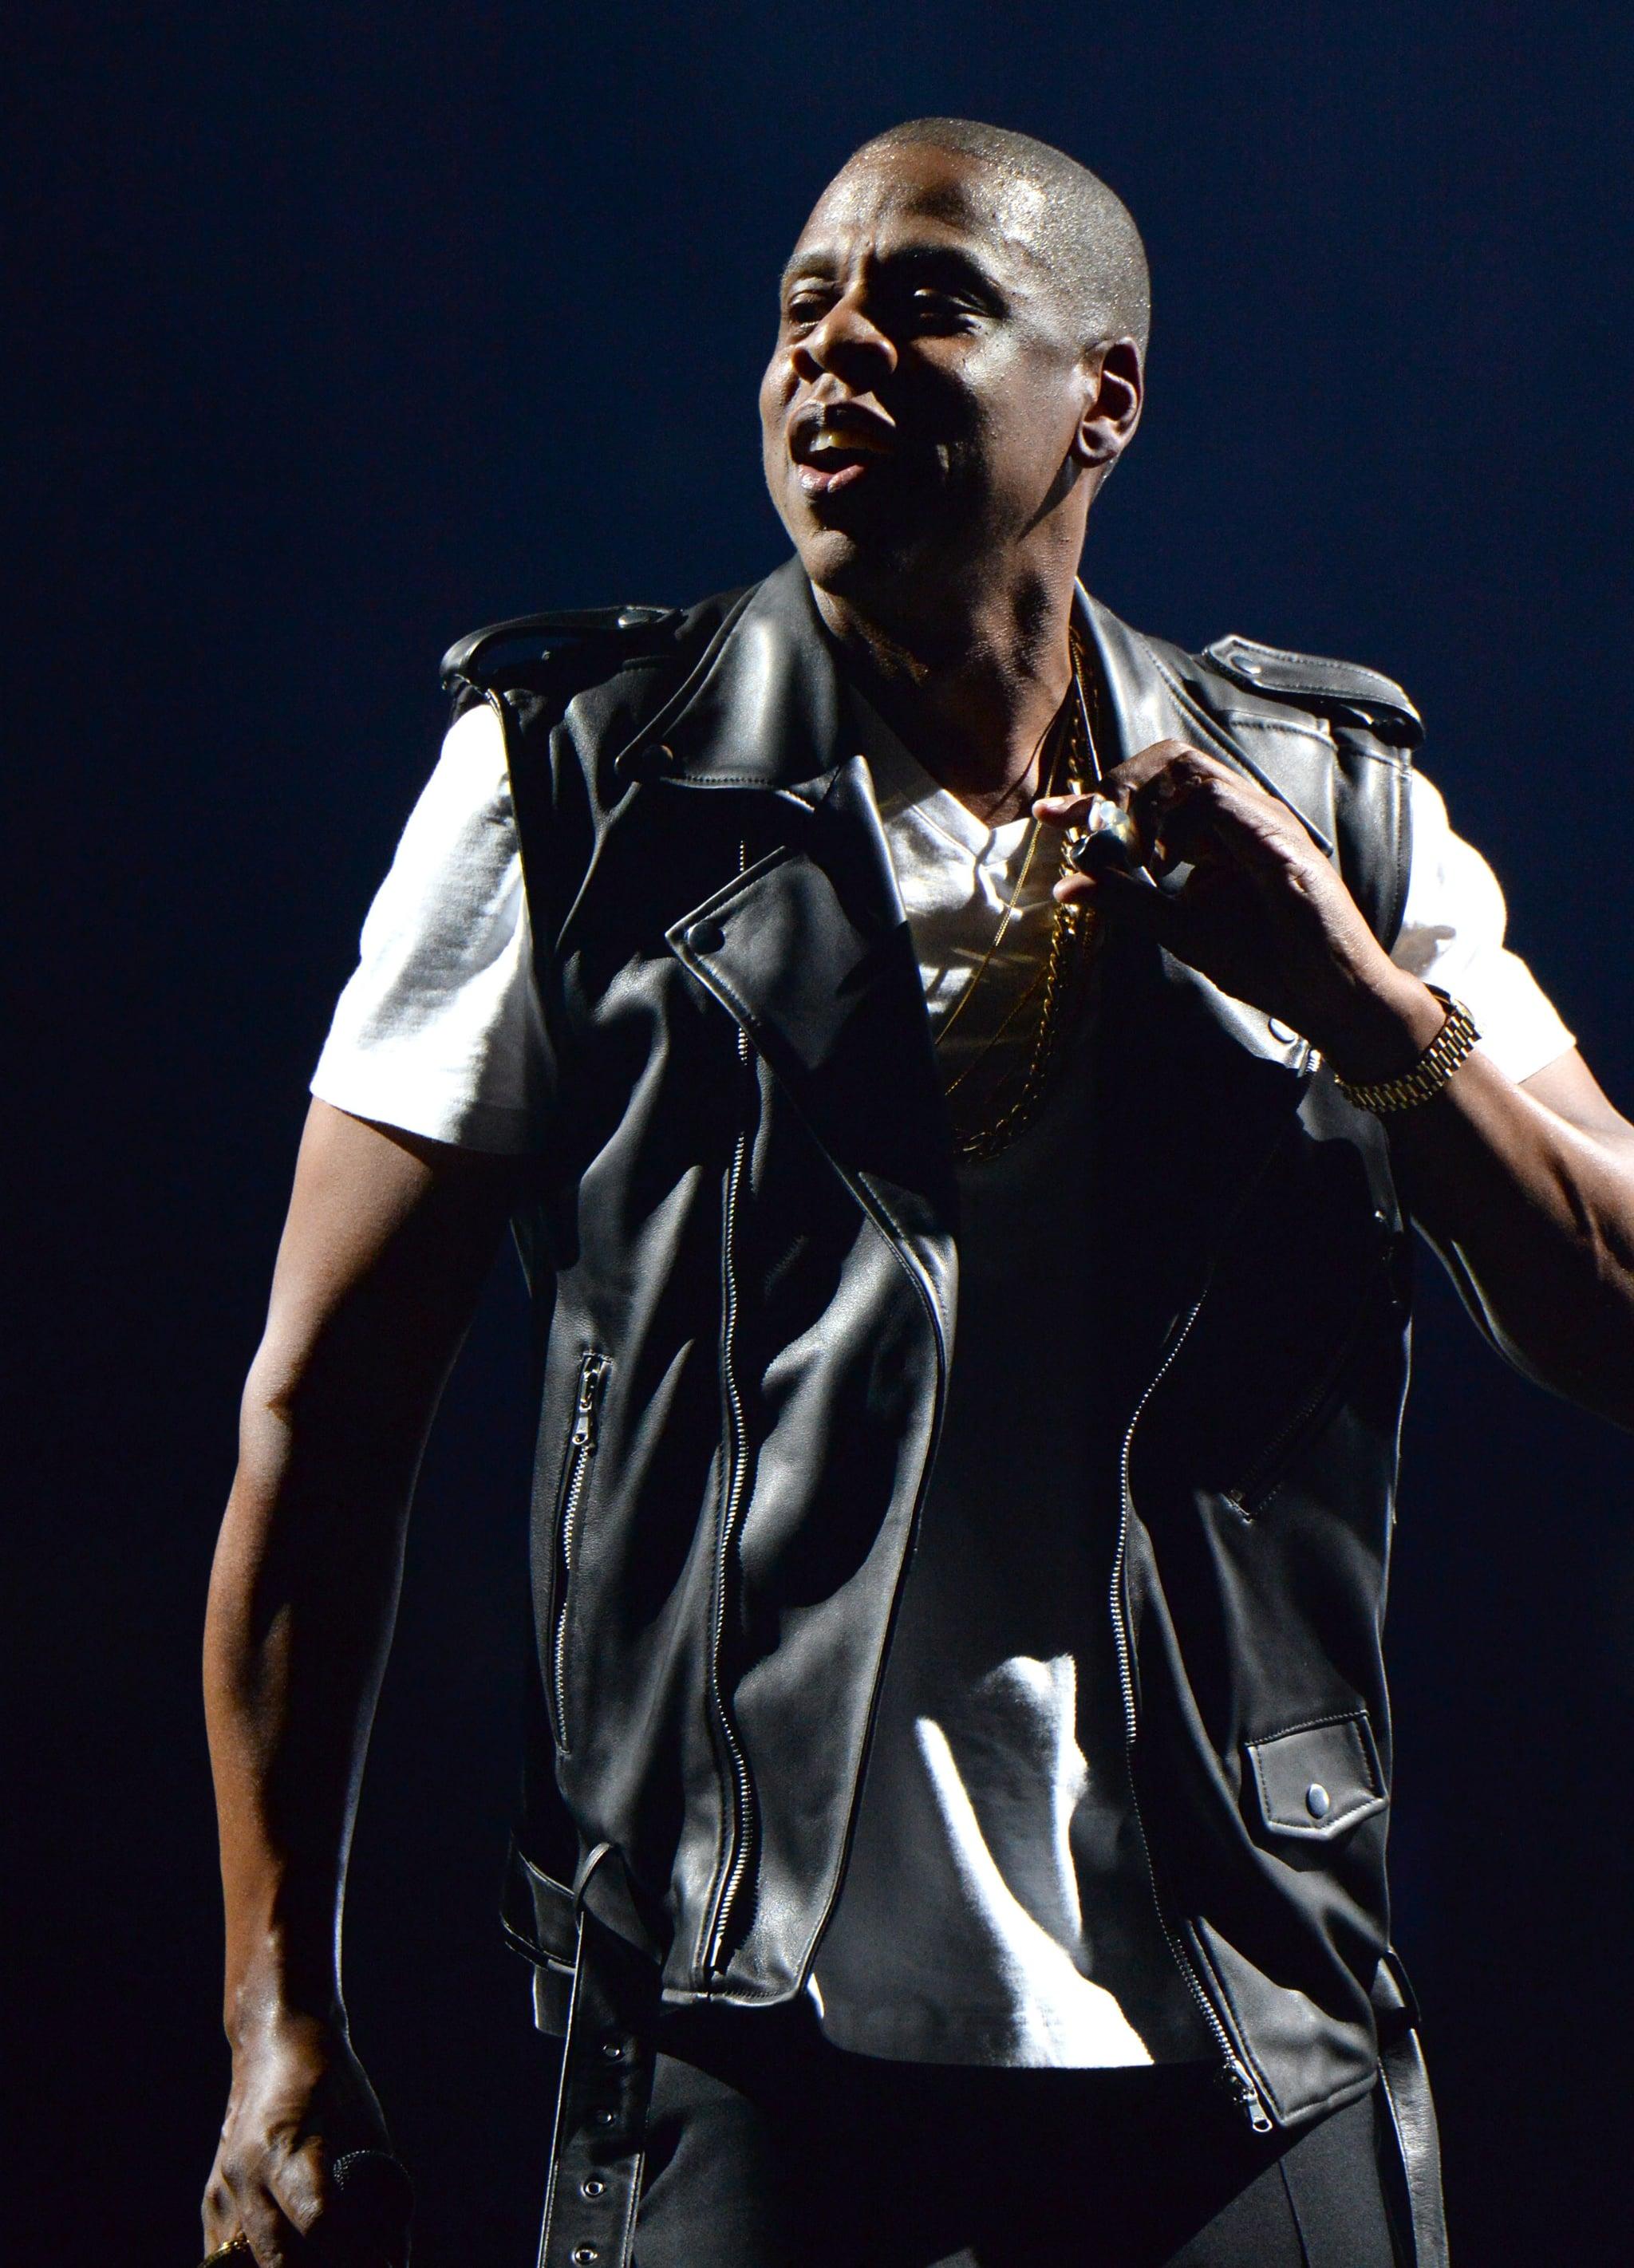 Jay Z in BLK DNM